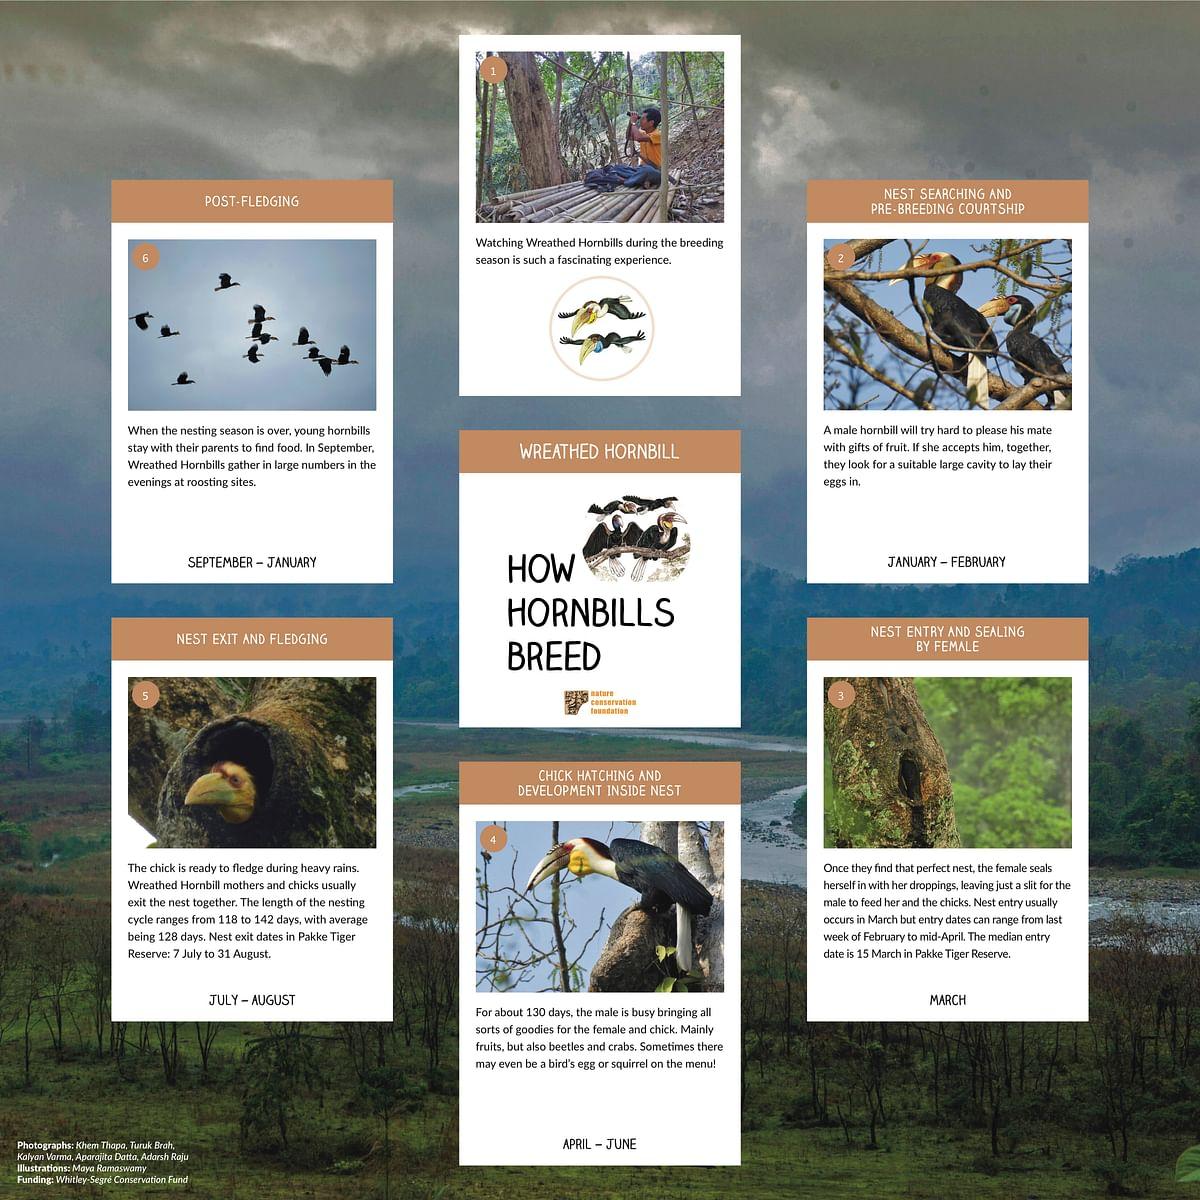 How Hornbills Breed: Wreathed Hornbills